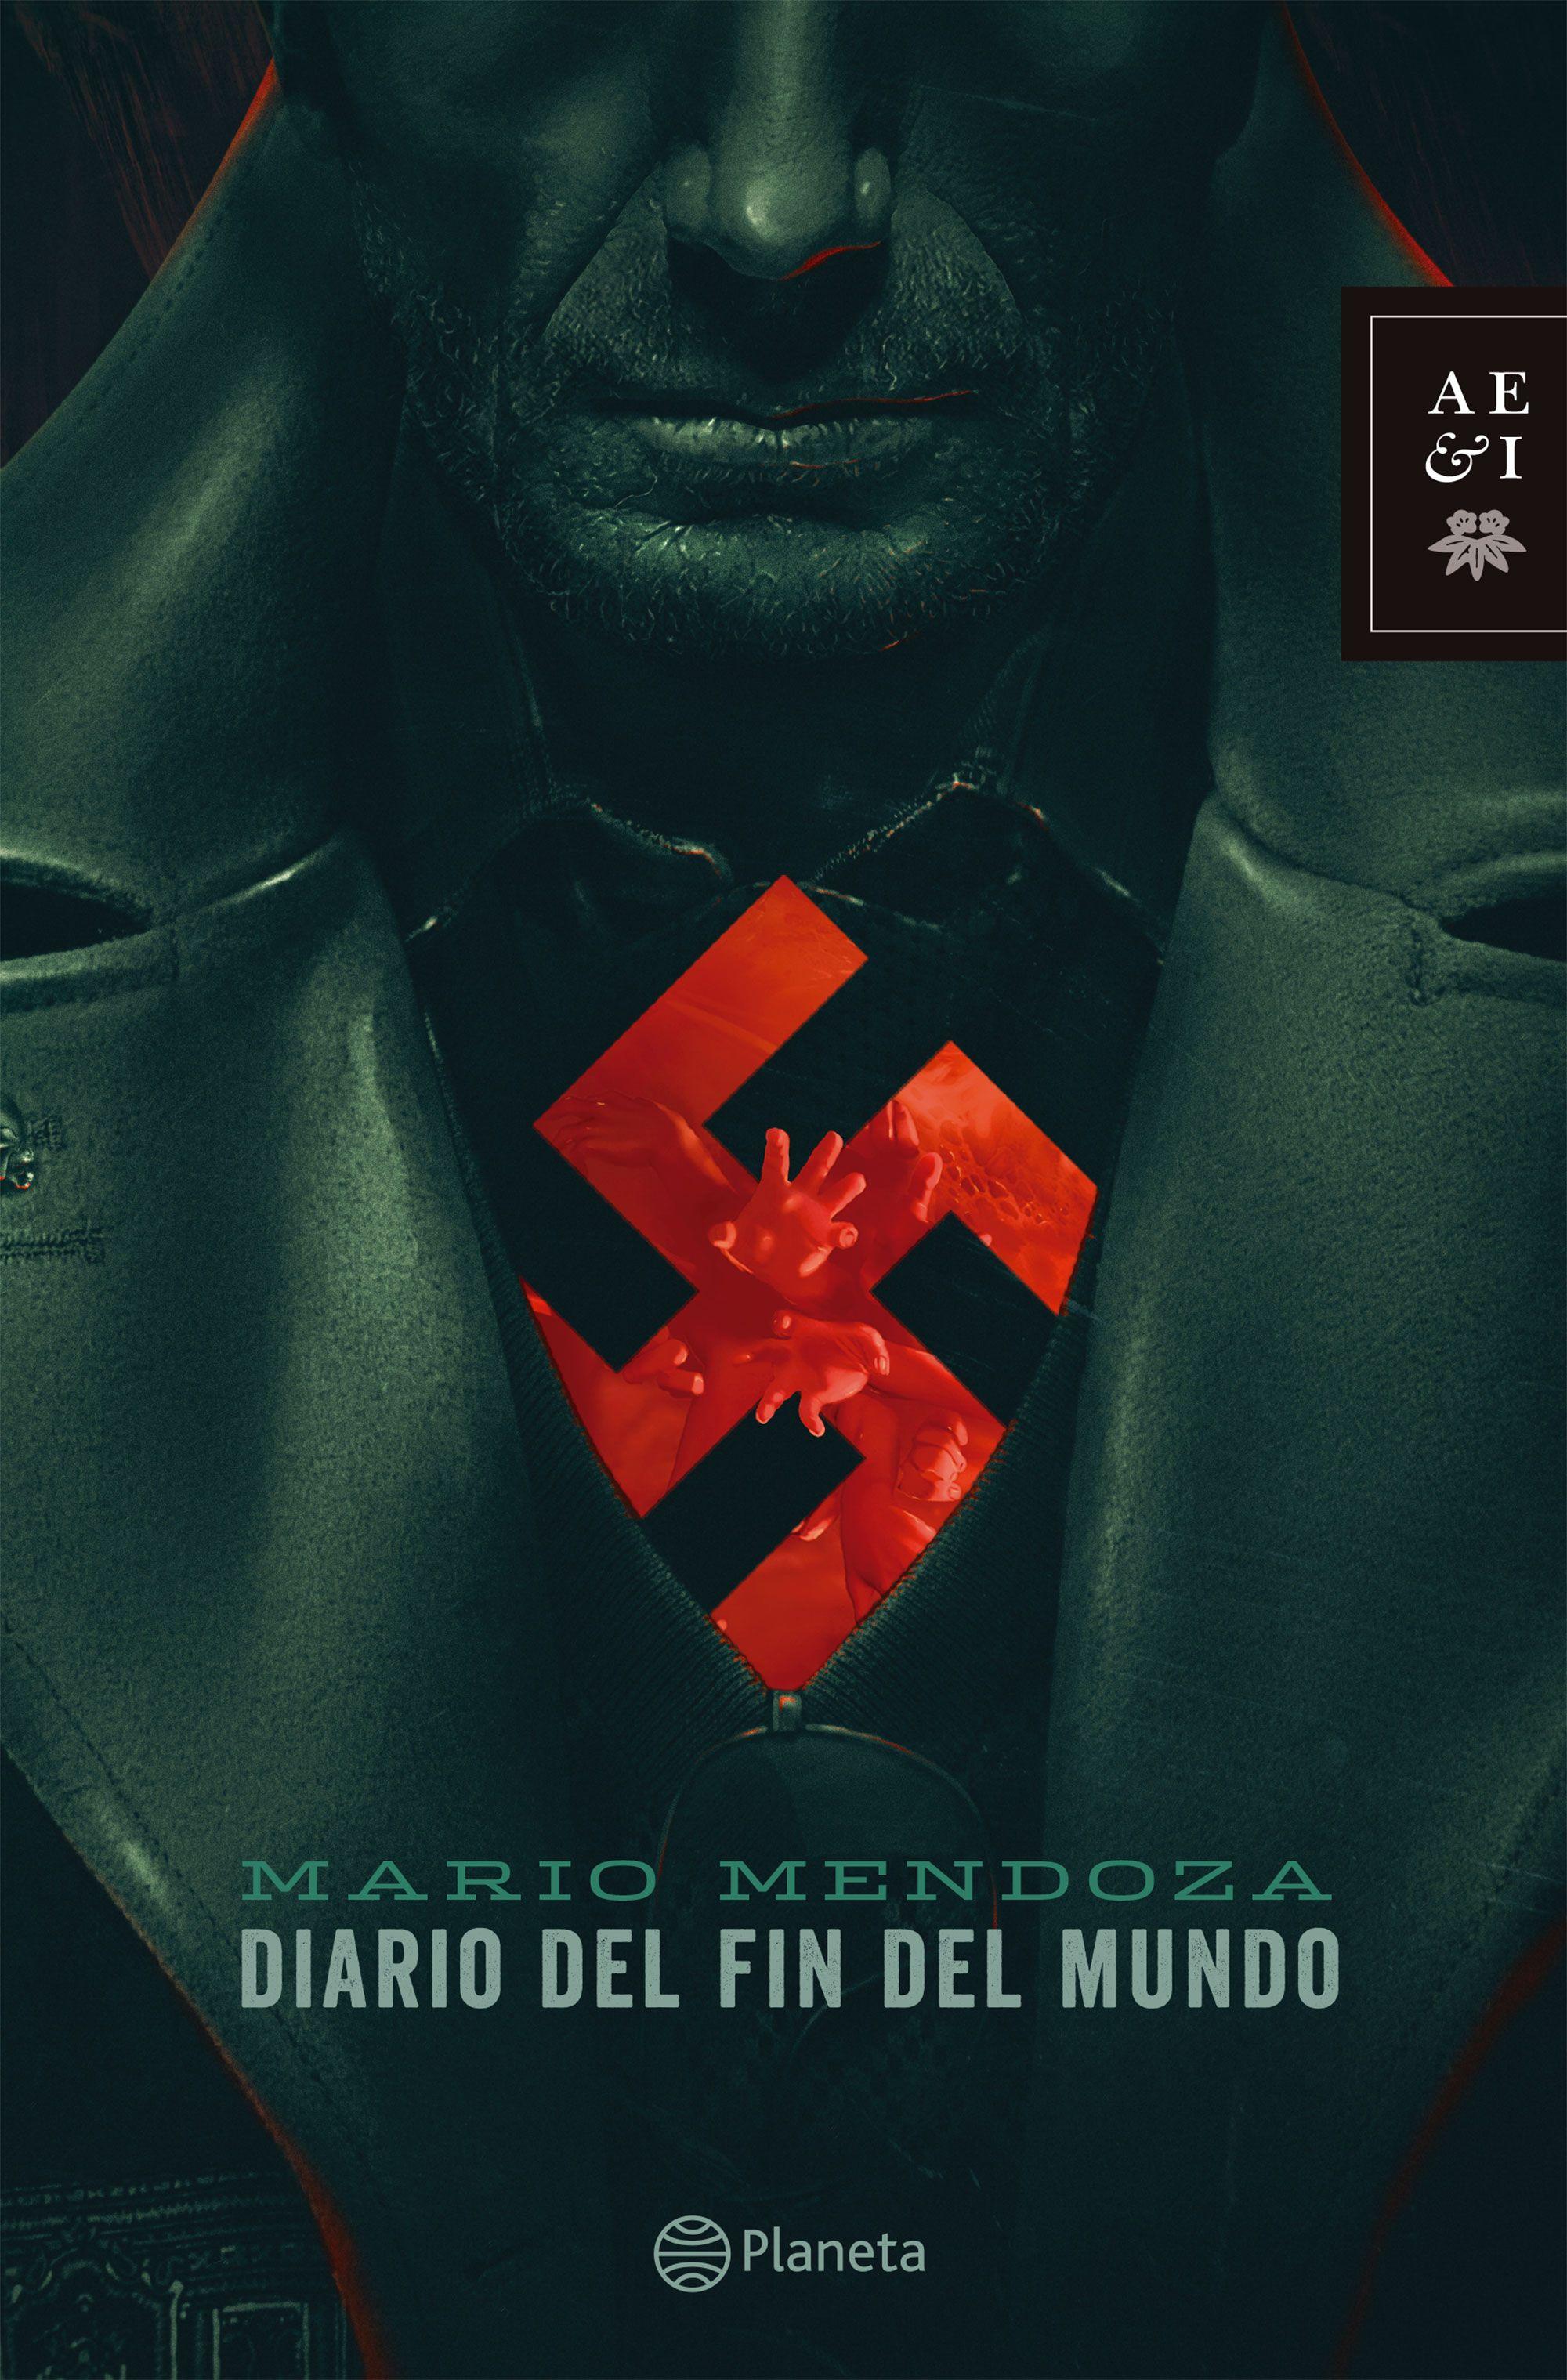 Diario del fin del Mundo - Mario Mendoza - Planeta